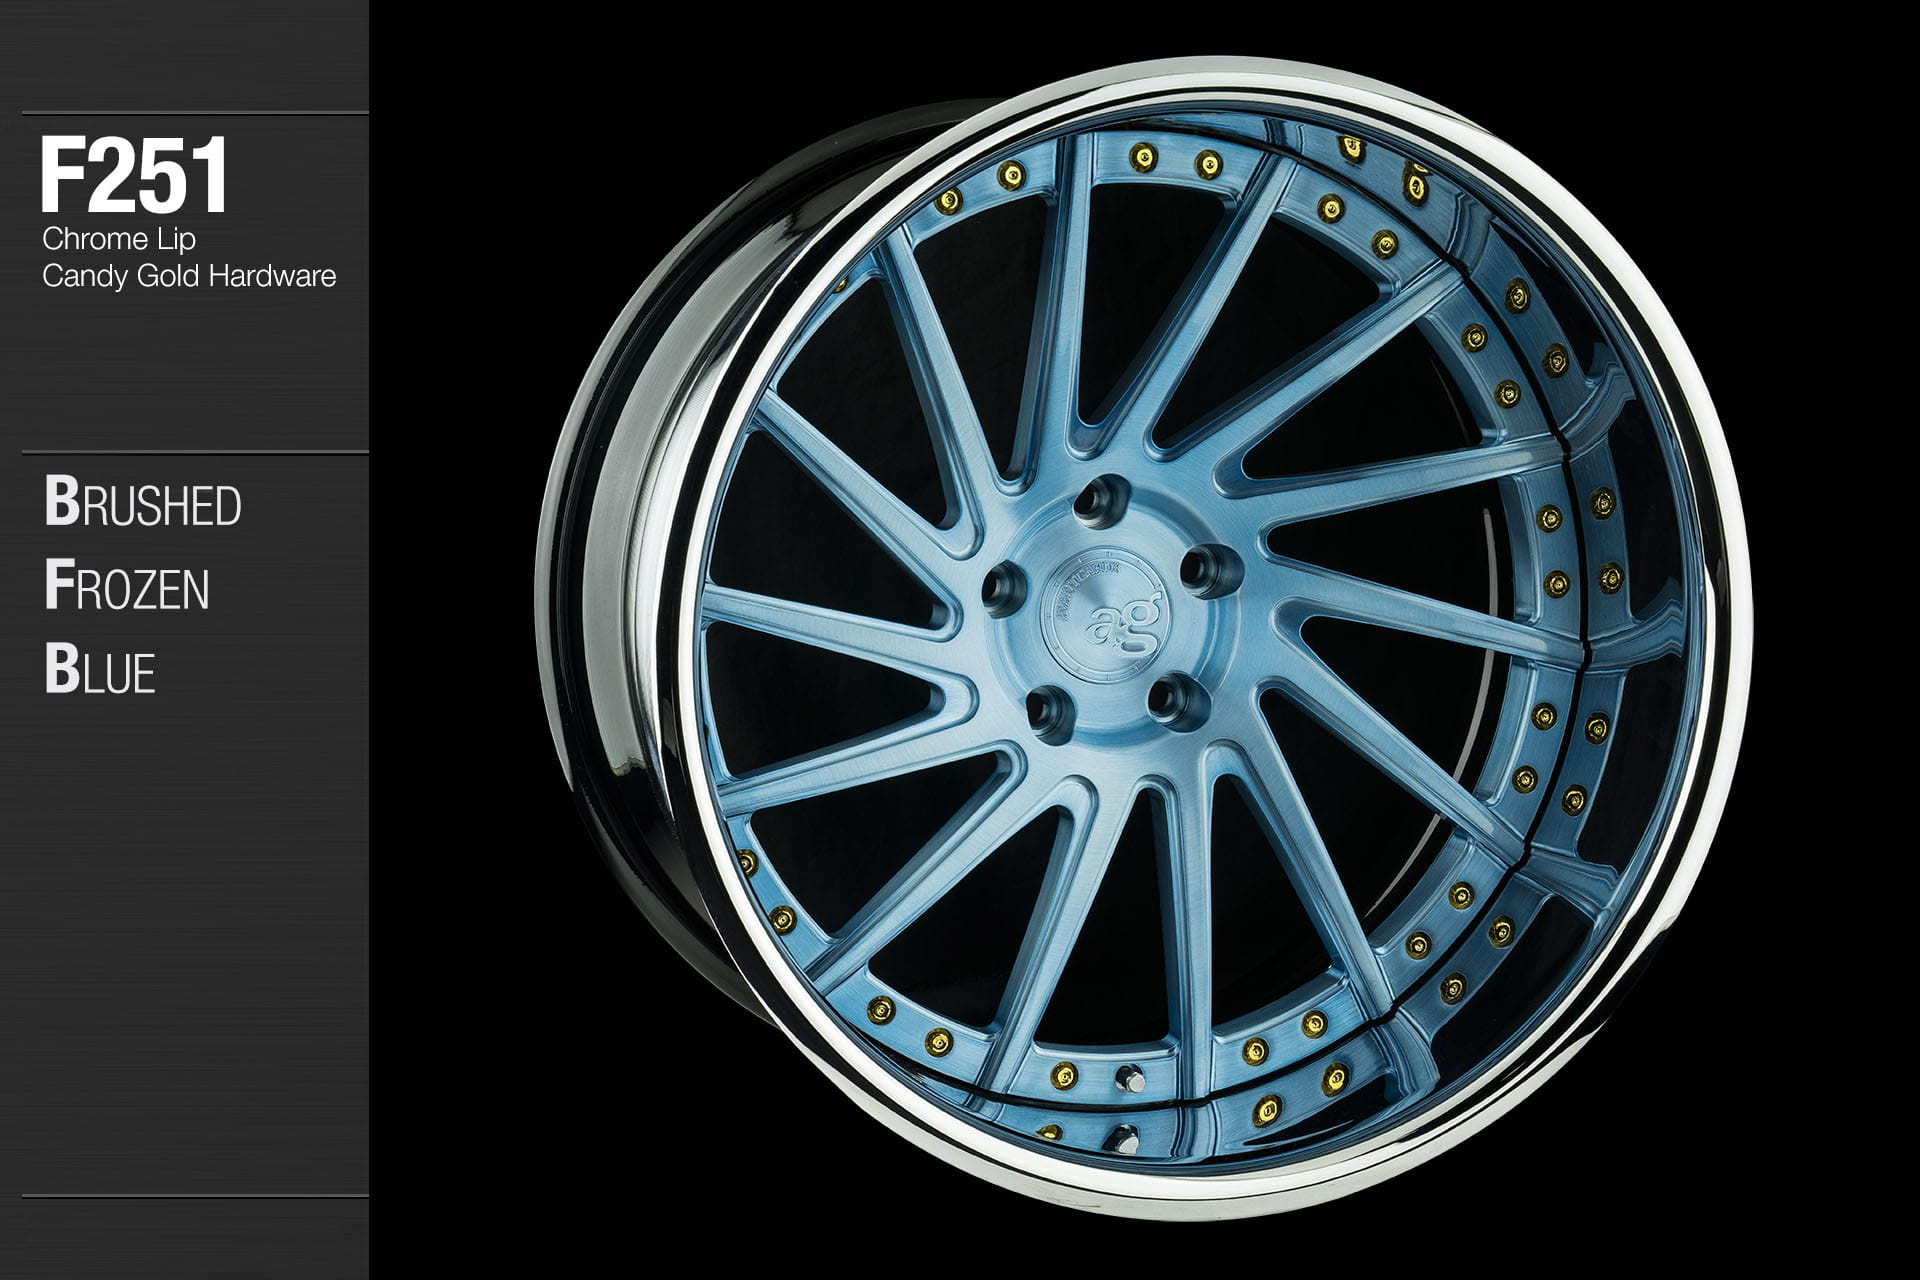 avant-garde-ag-wheels-f251-brushed-frozen-blue-face-chrome-lip-candy-gold-hardware-4-min